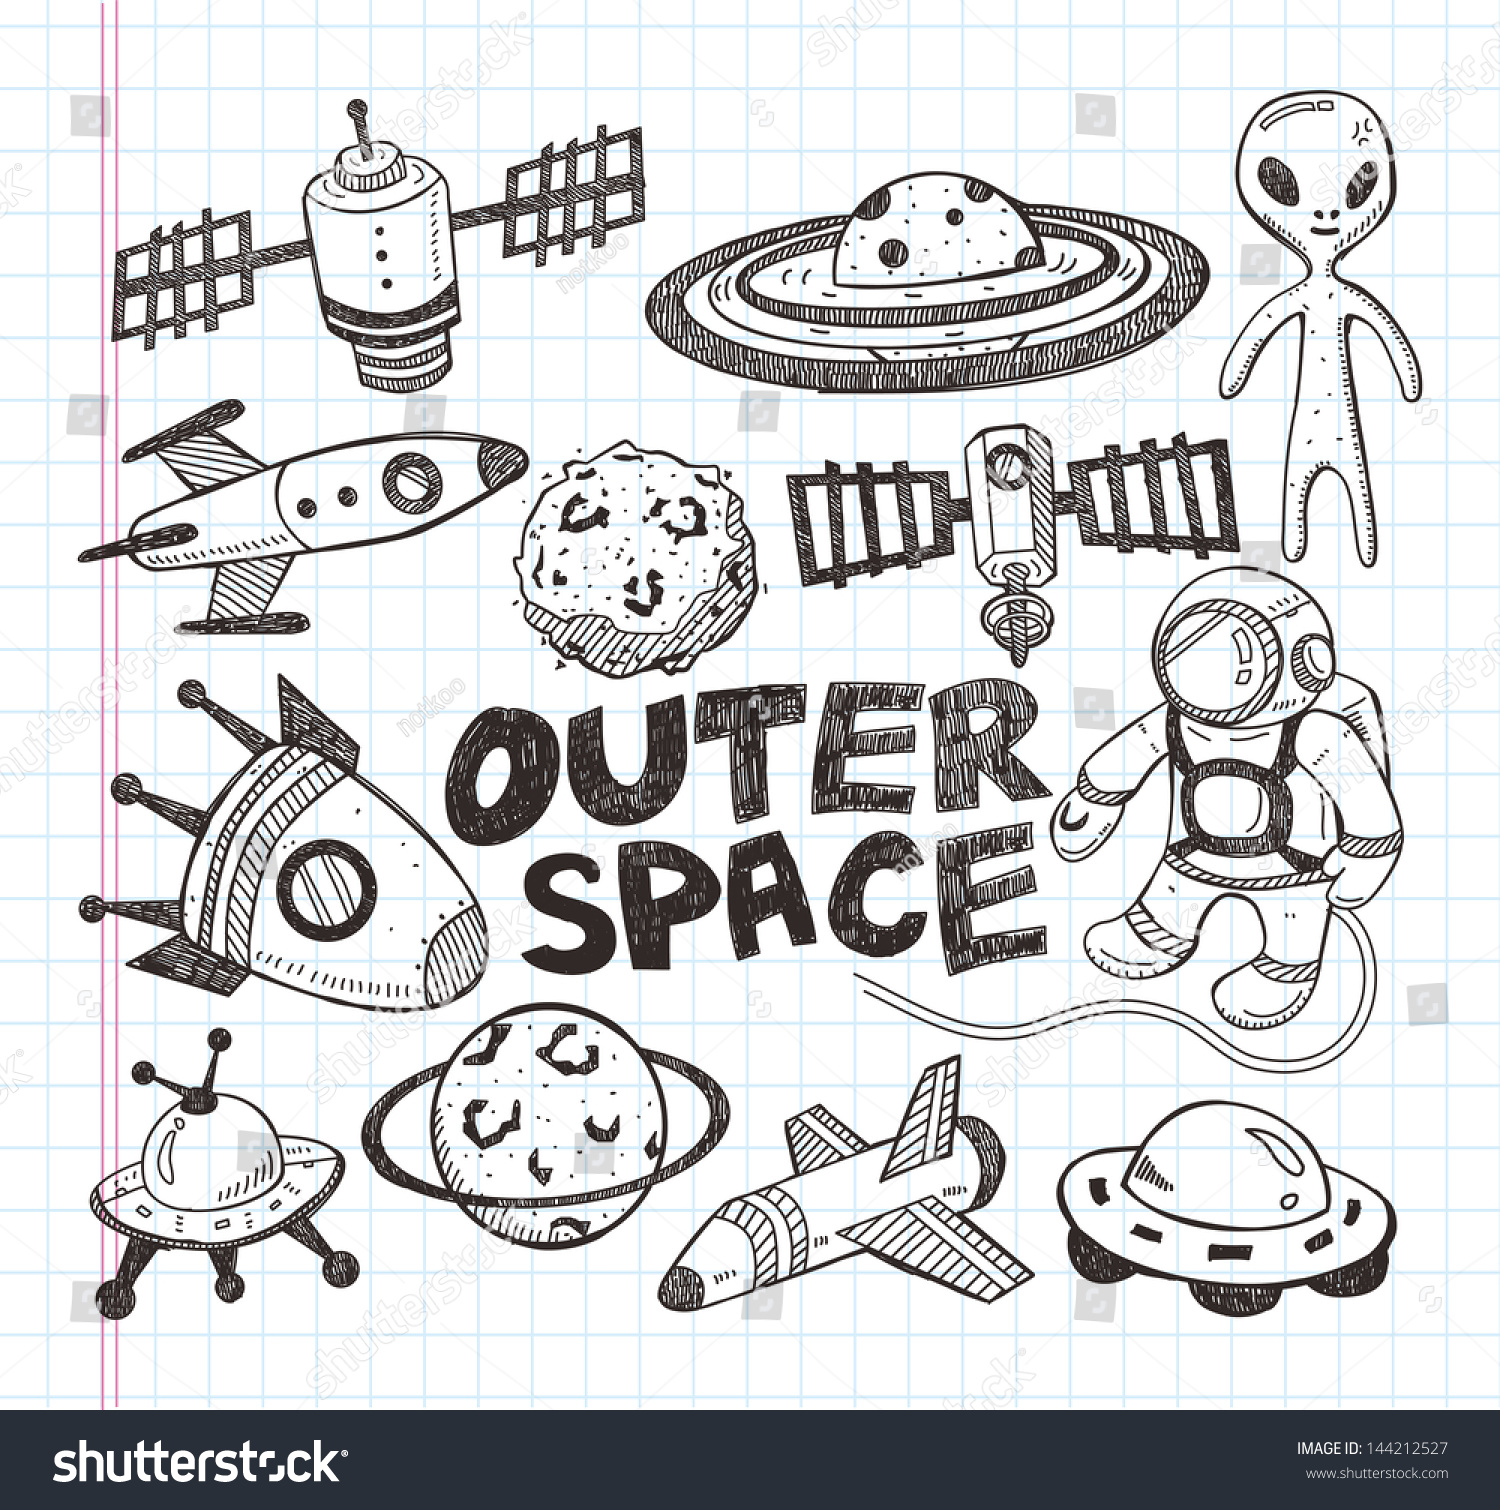 Line Art Doodles : Doodle space element icons illustrator line stock vector